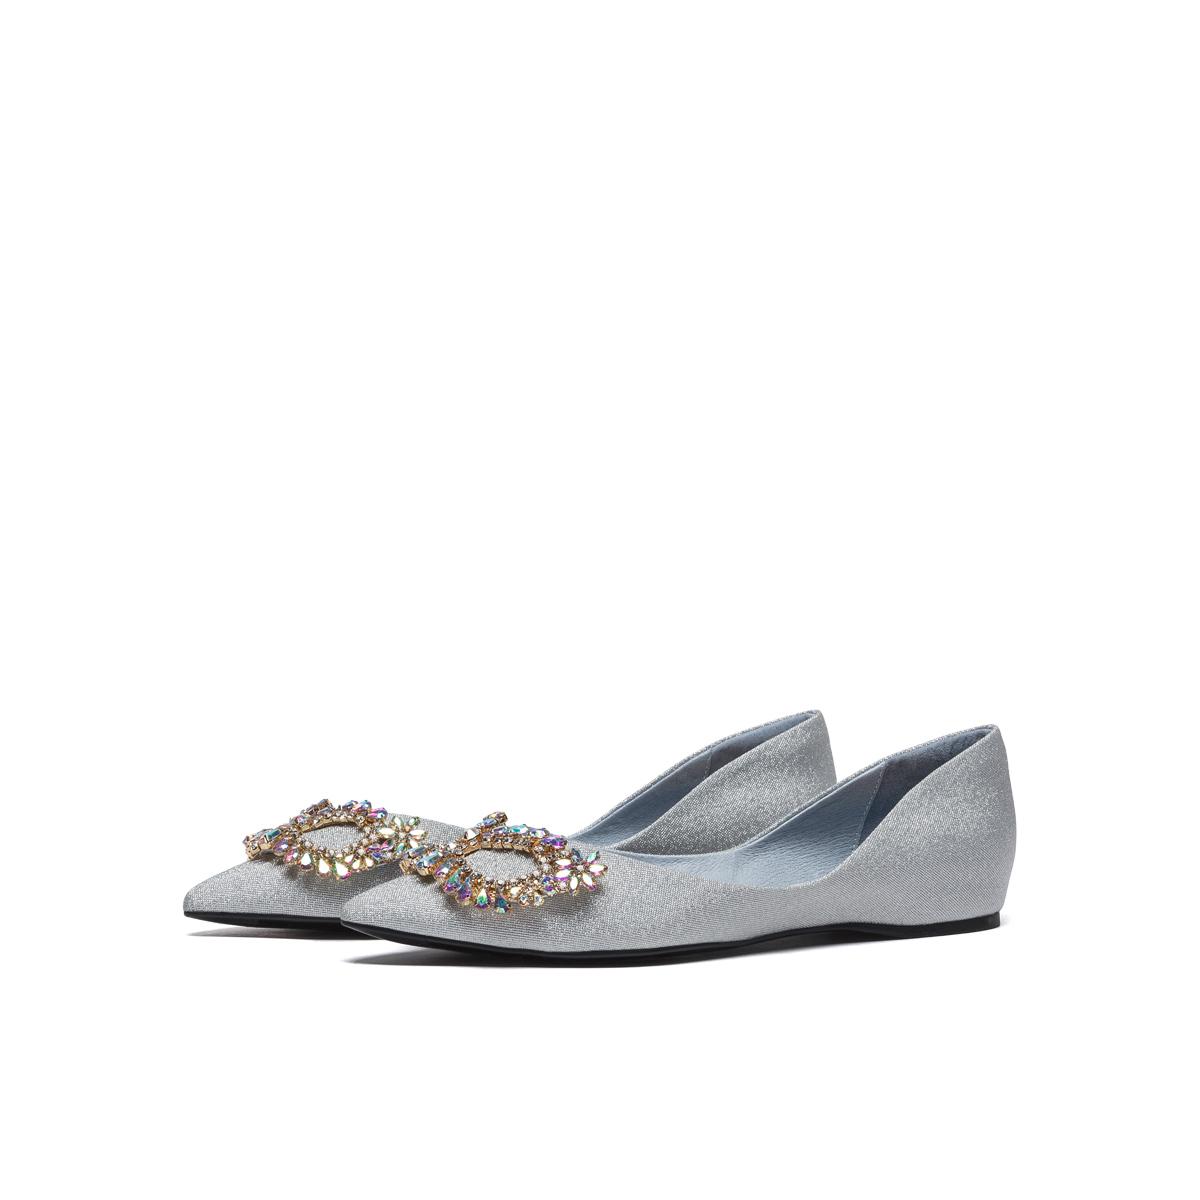 SS11111688 春季低平跟假面欧美尖头女鞋 2021 星期六浅口单鞋 直